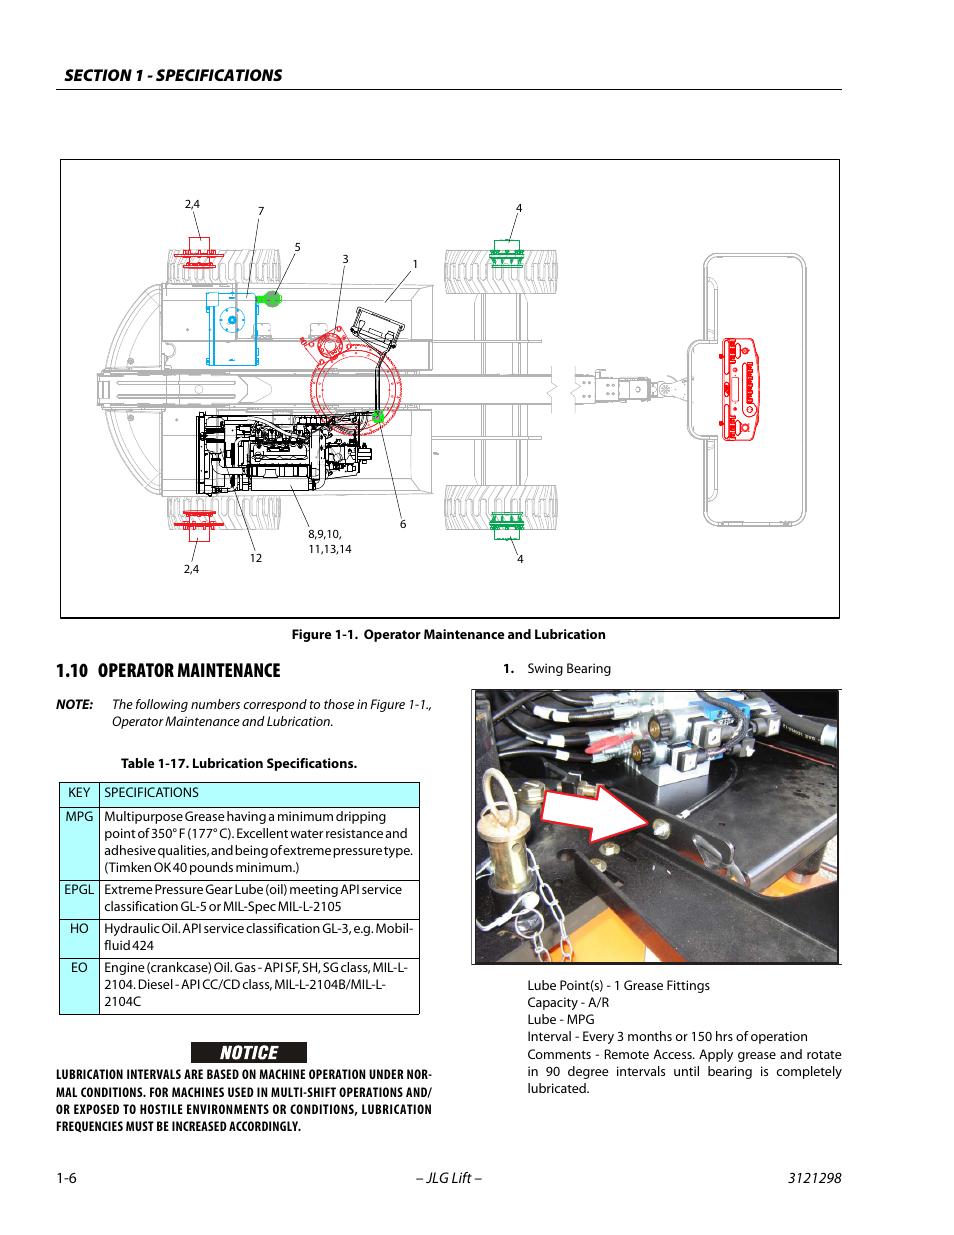 10 Operator Maintenance  Operator Maintenance